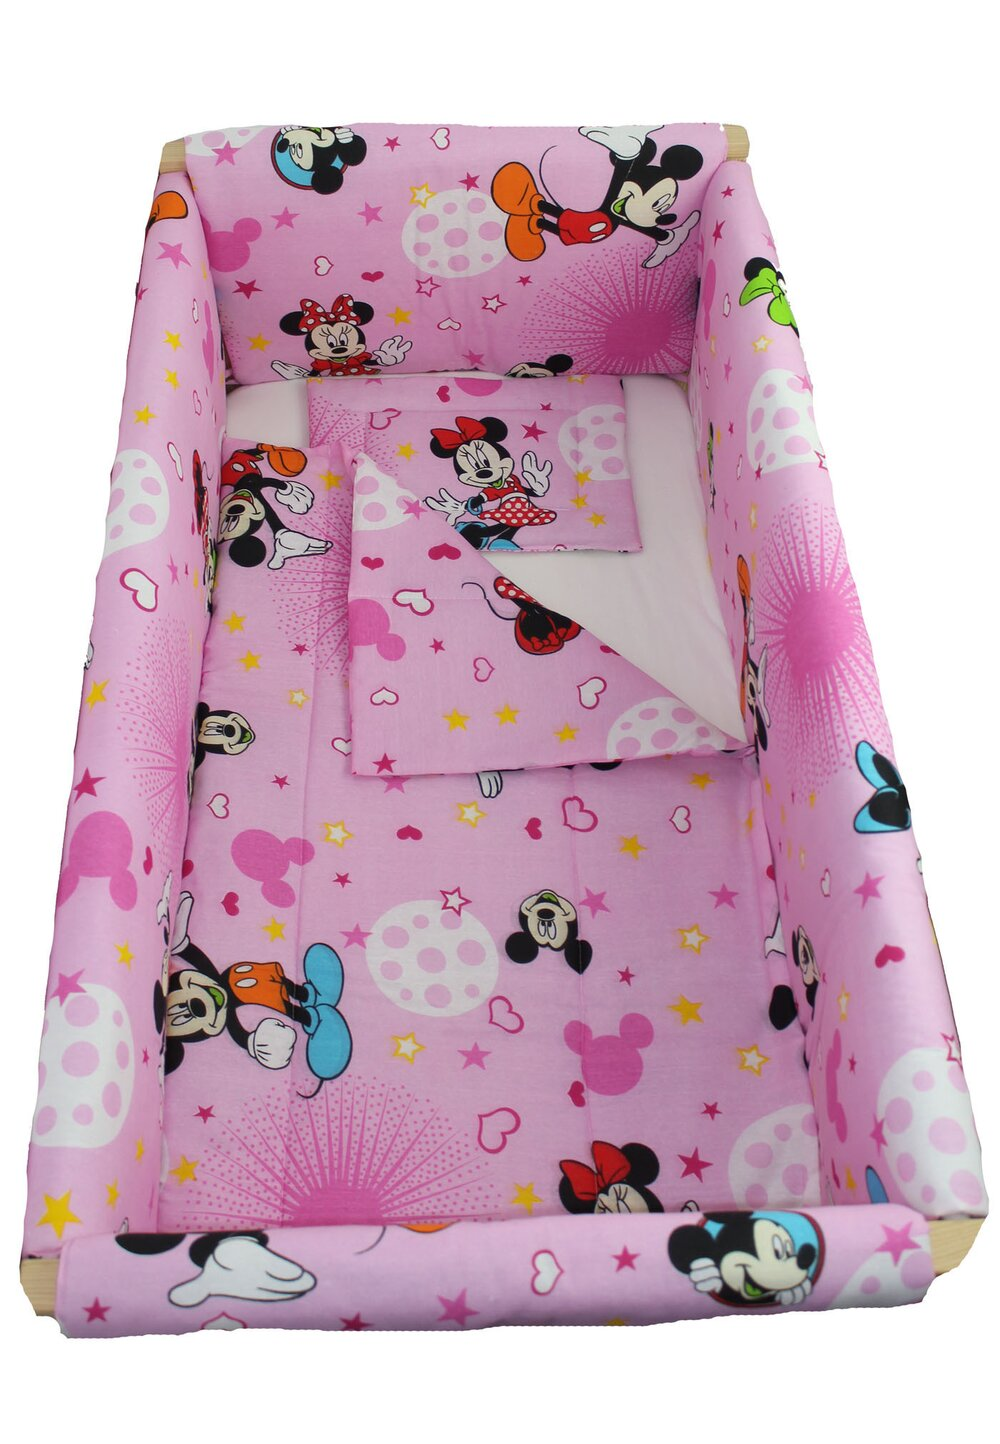 Lenjerie 7 piese, Maxi, Minnie si Mickey, roz cu stelute, 120x60cm imagine